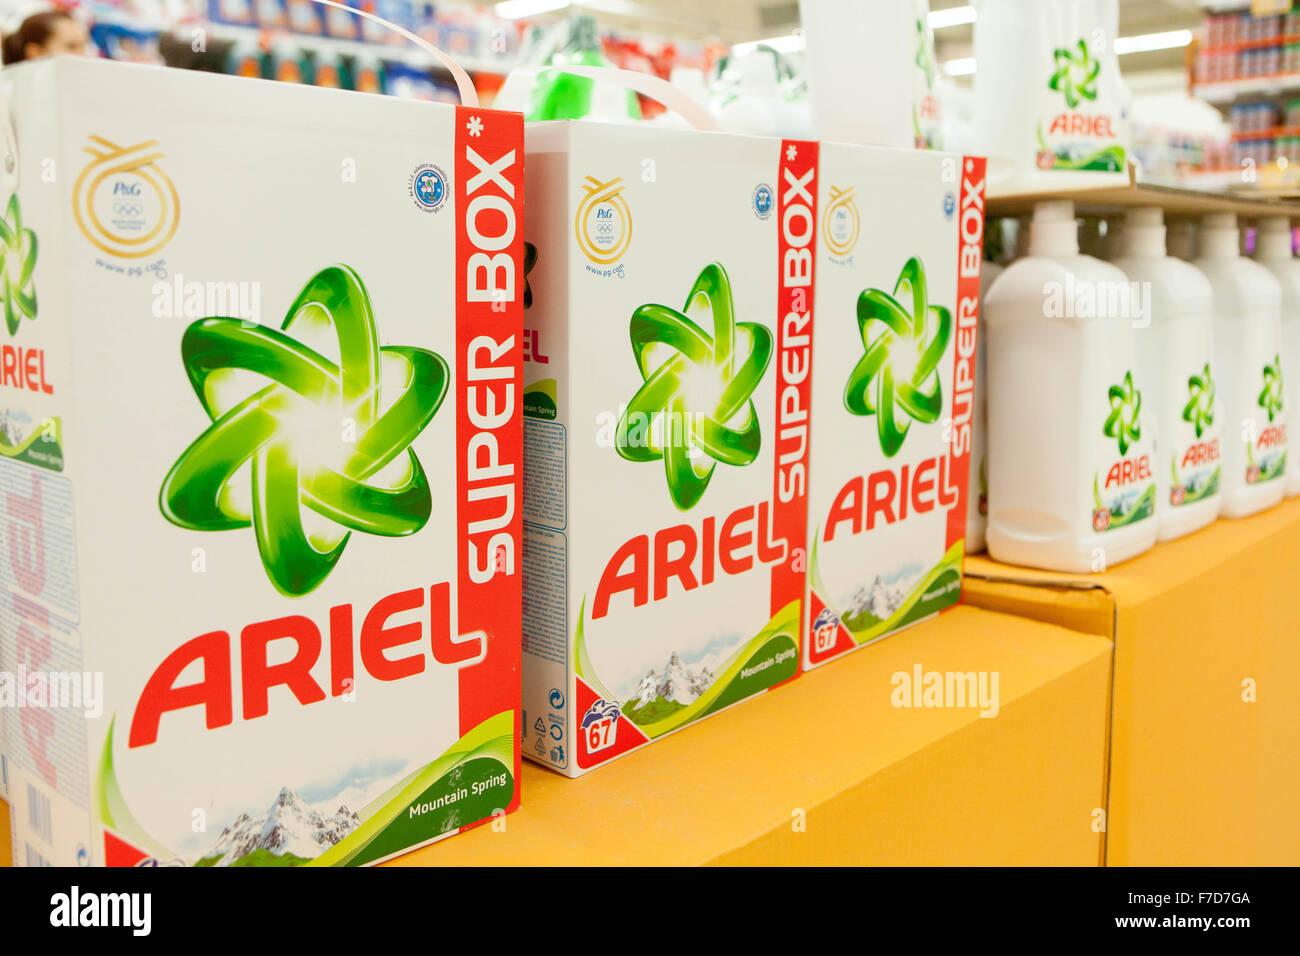 Washing Powder Ariel Czech Republic Supermarket Sales